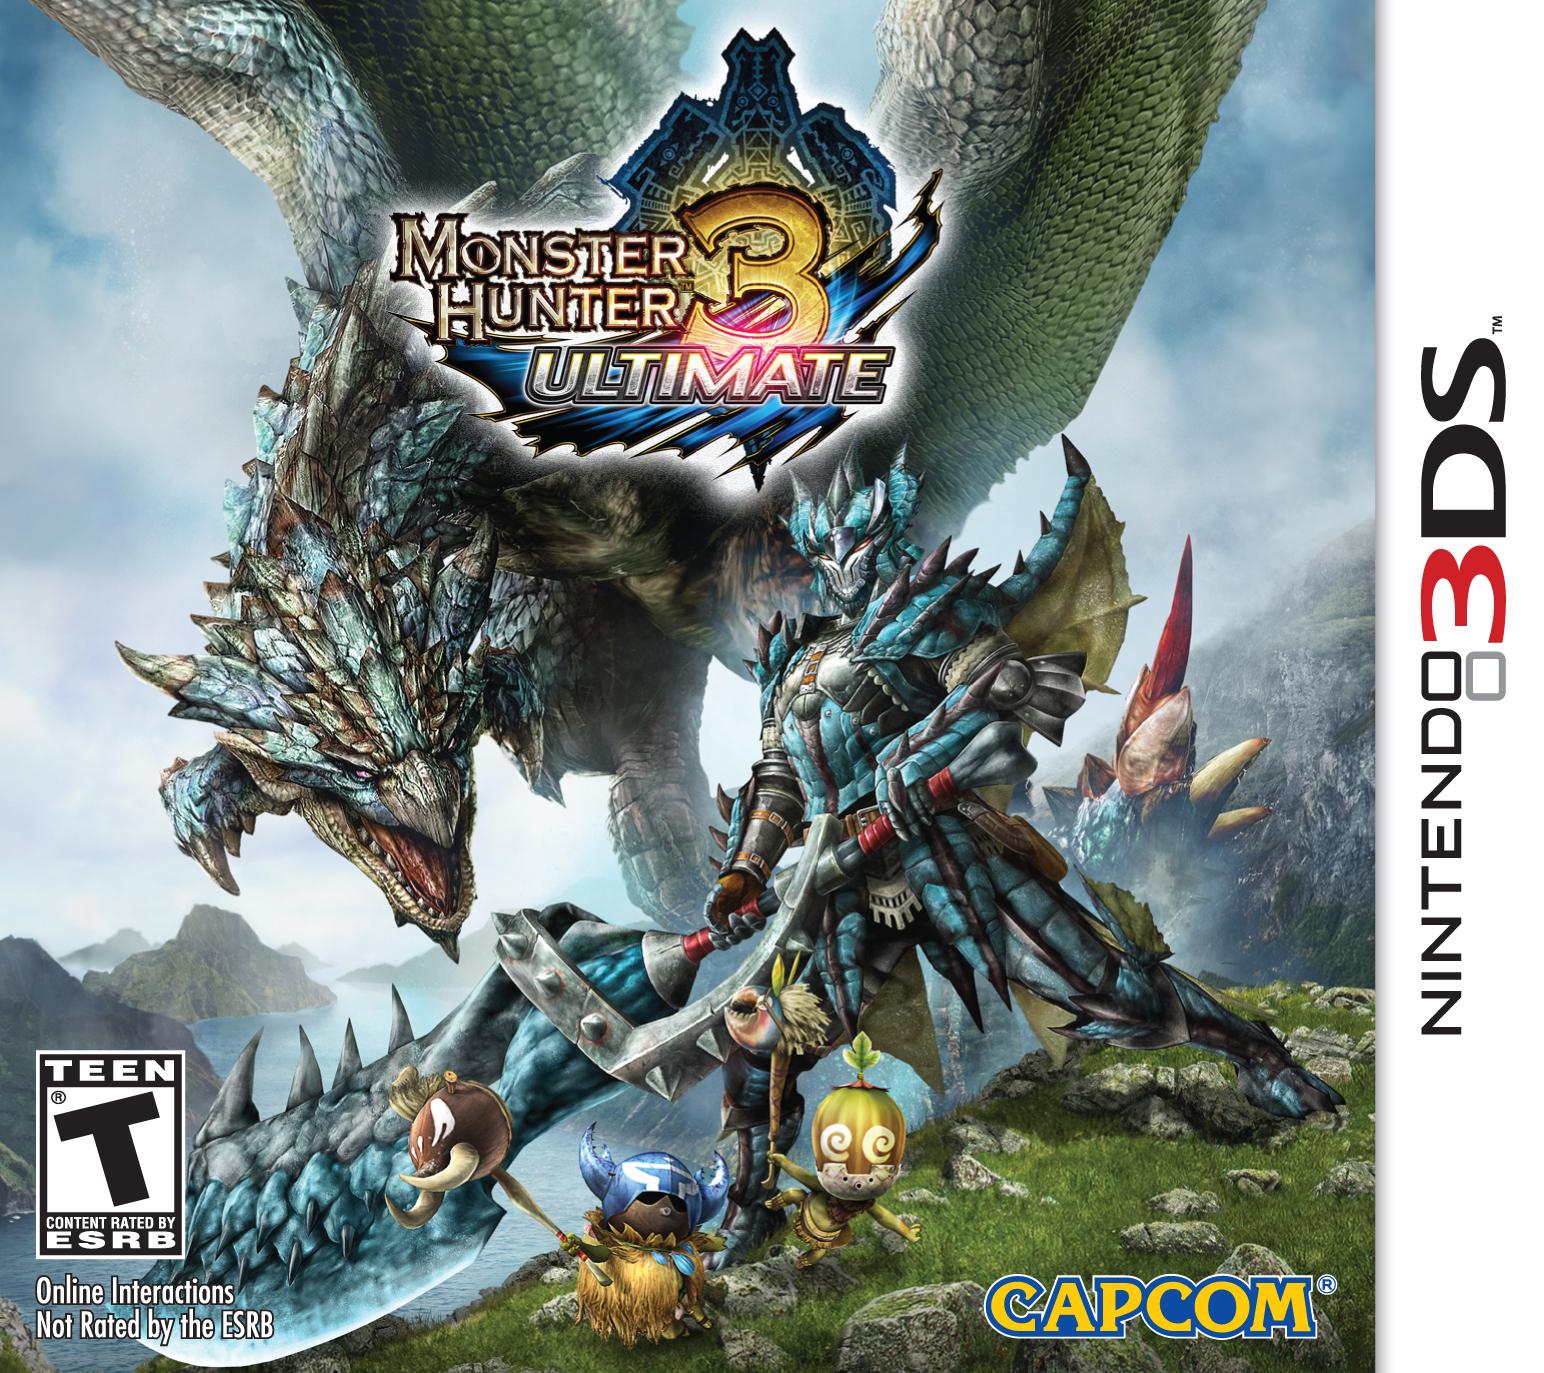 PN Review: Monster Hunter 3 Ultimate (3DS)